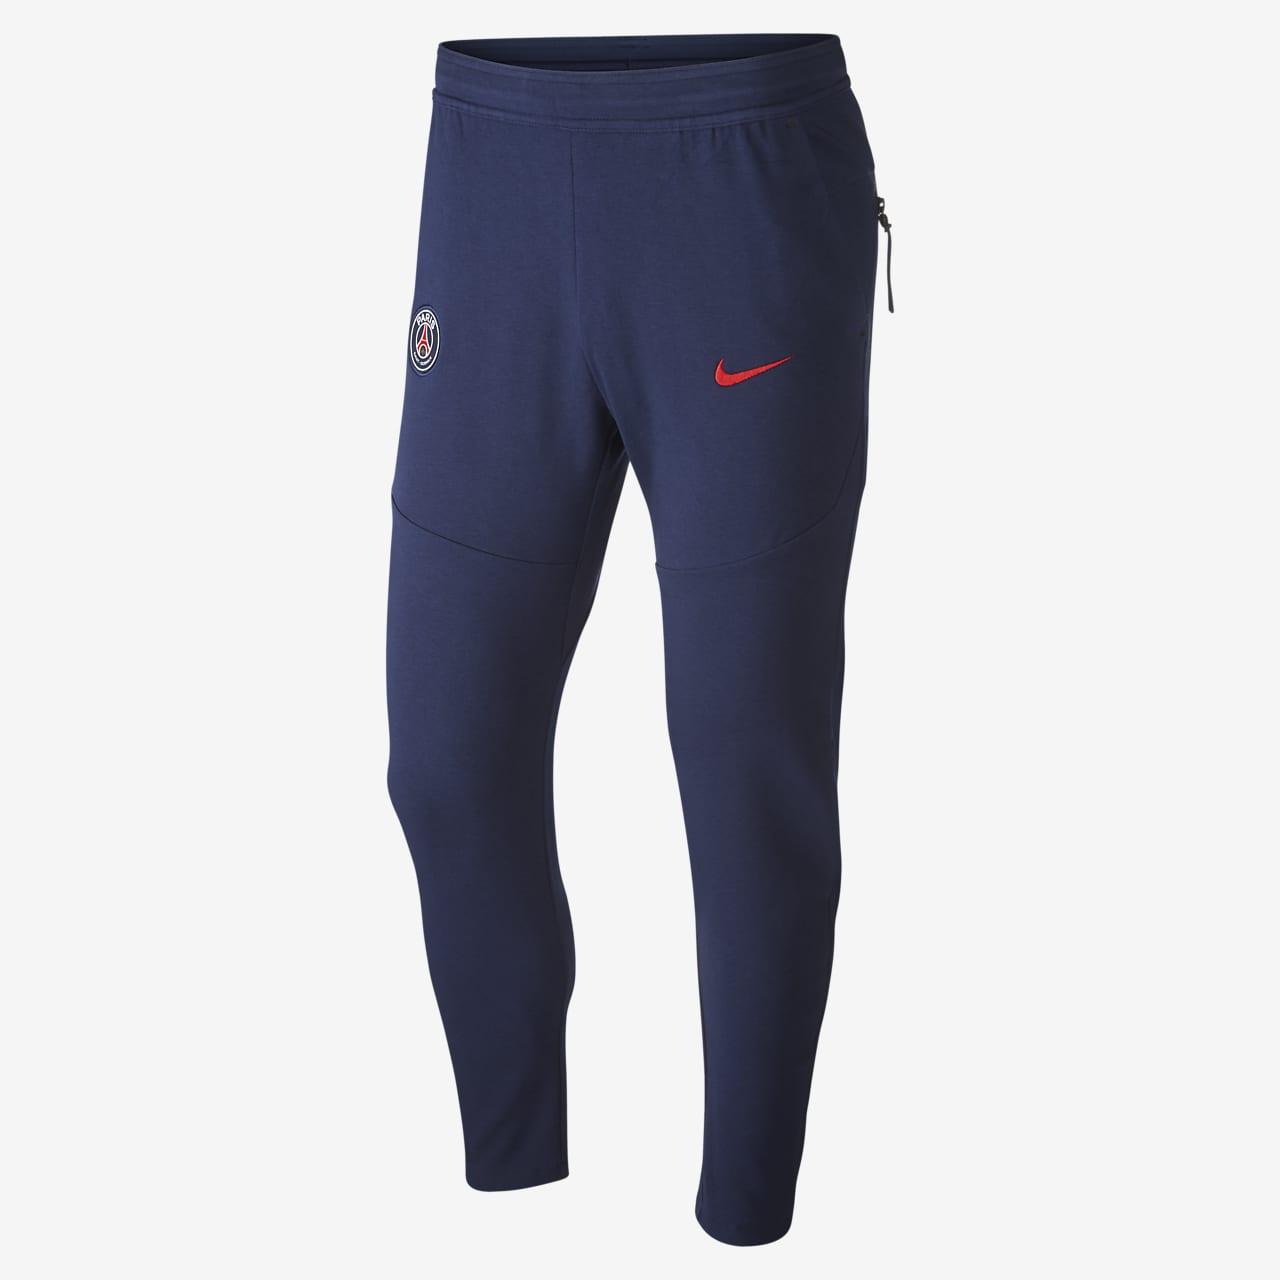 Мужские брюки ФК «Пари Сен-Жермен» Tech Pack